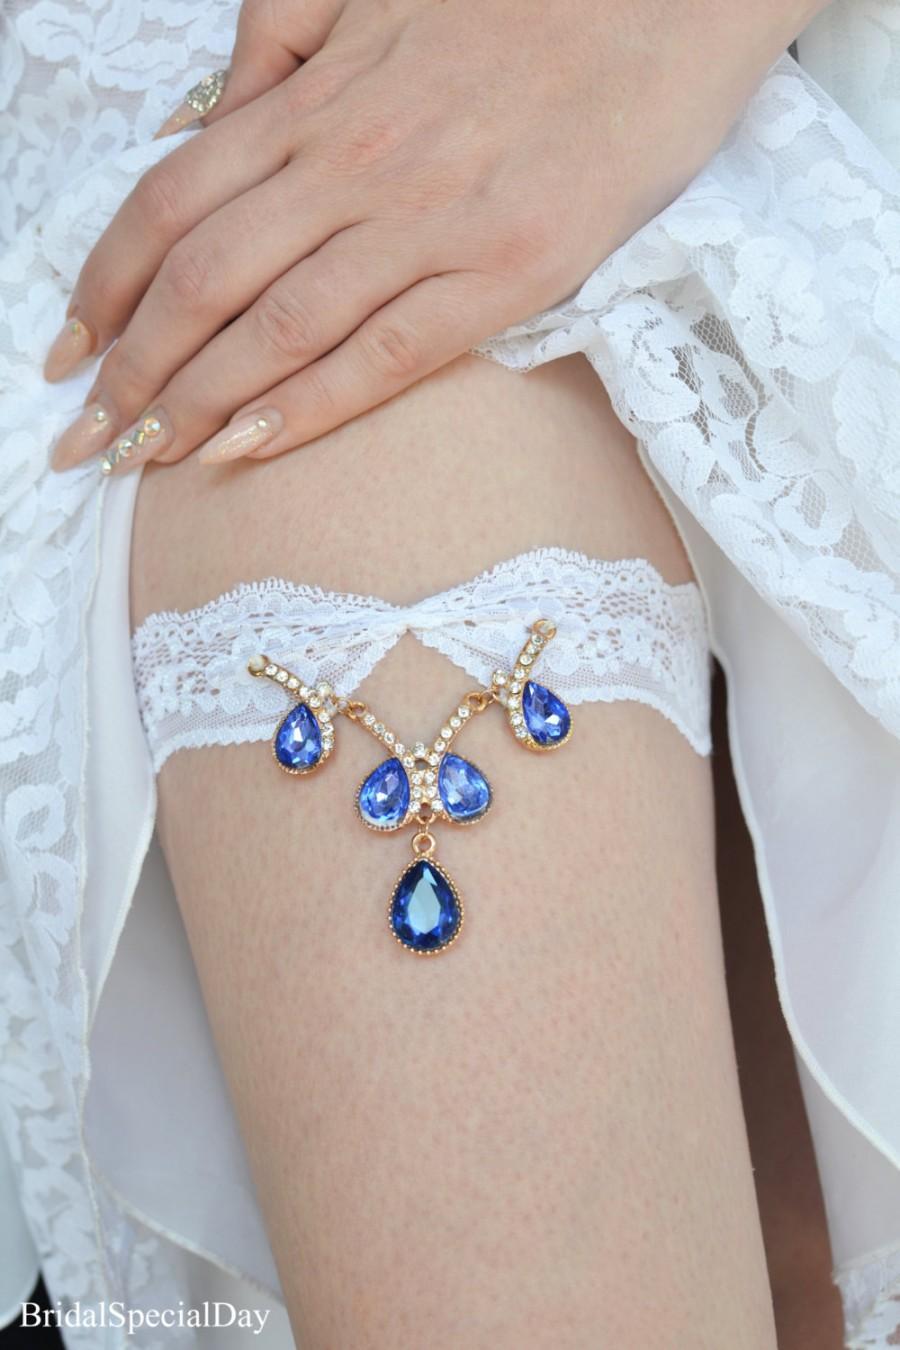 Mariage - White Lace Wedding Garter Set With Royal Blue Stone Applique Bridal Garter Set - Handmade Wedding Accessories